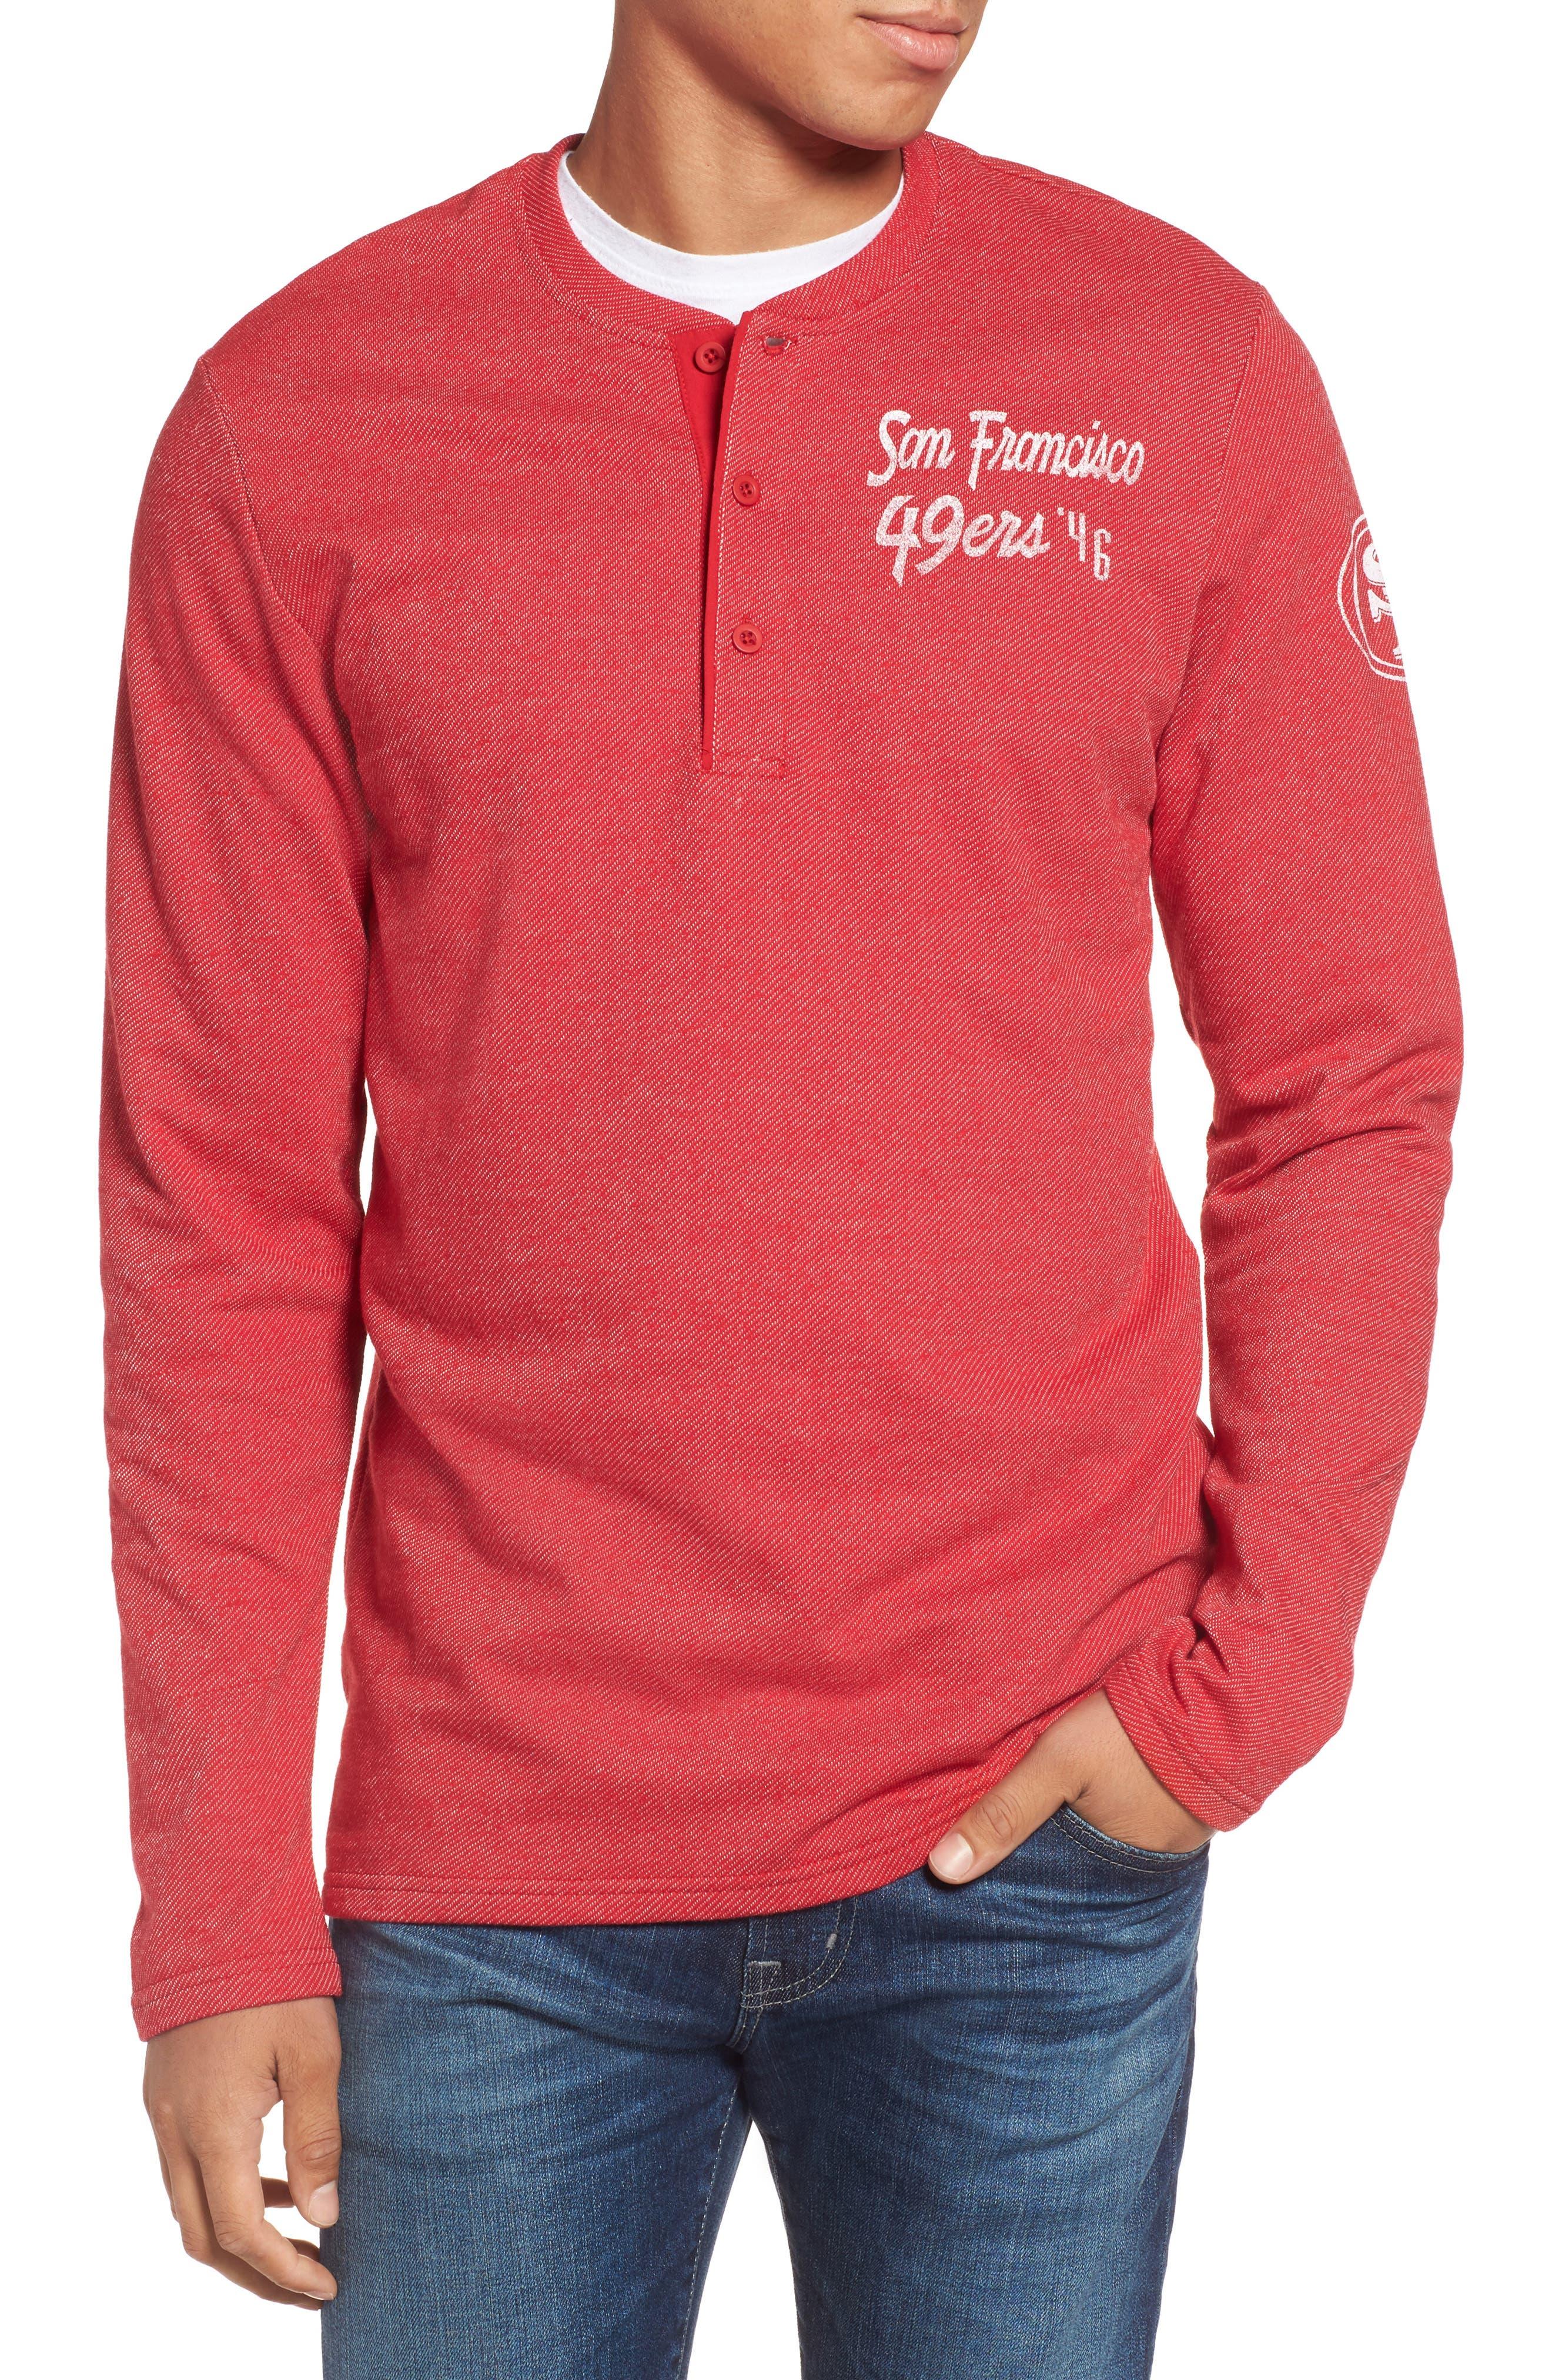 San Francesco 49ers Henley,                         Main,                         color, Red